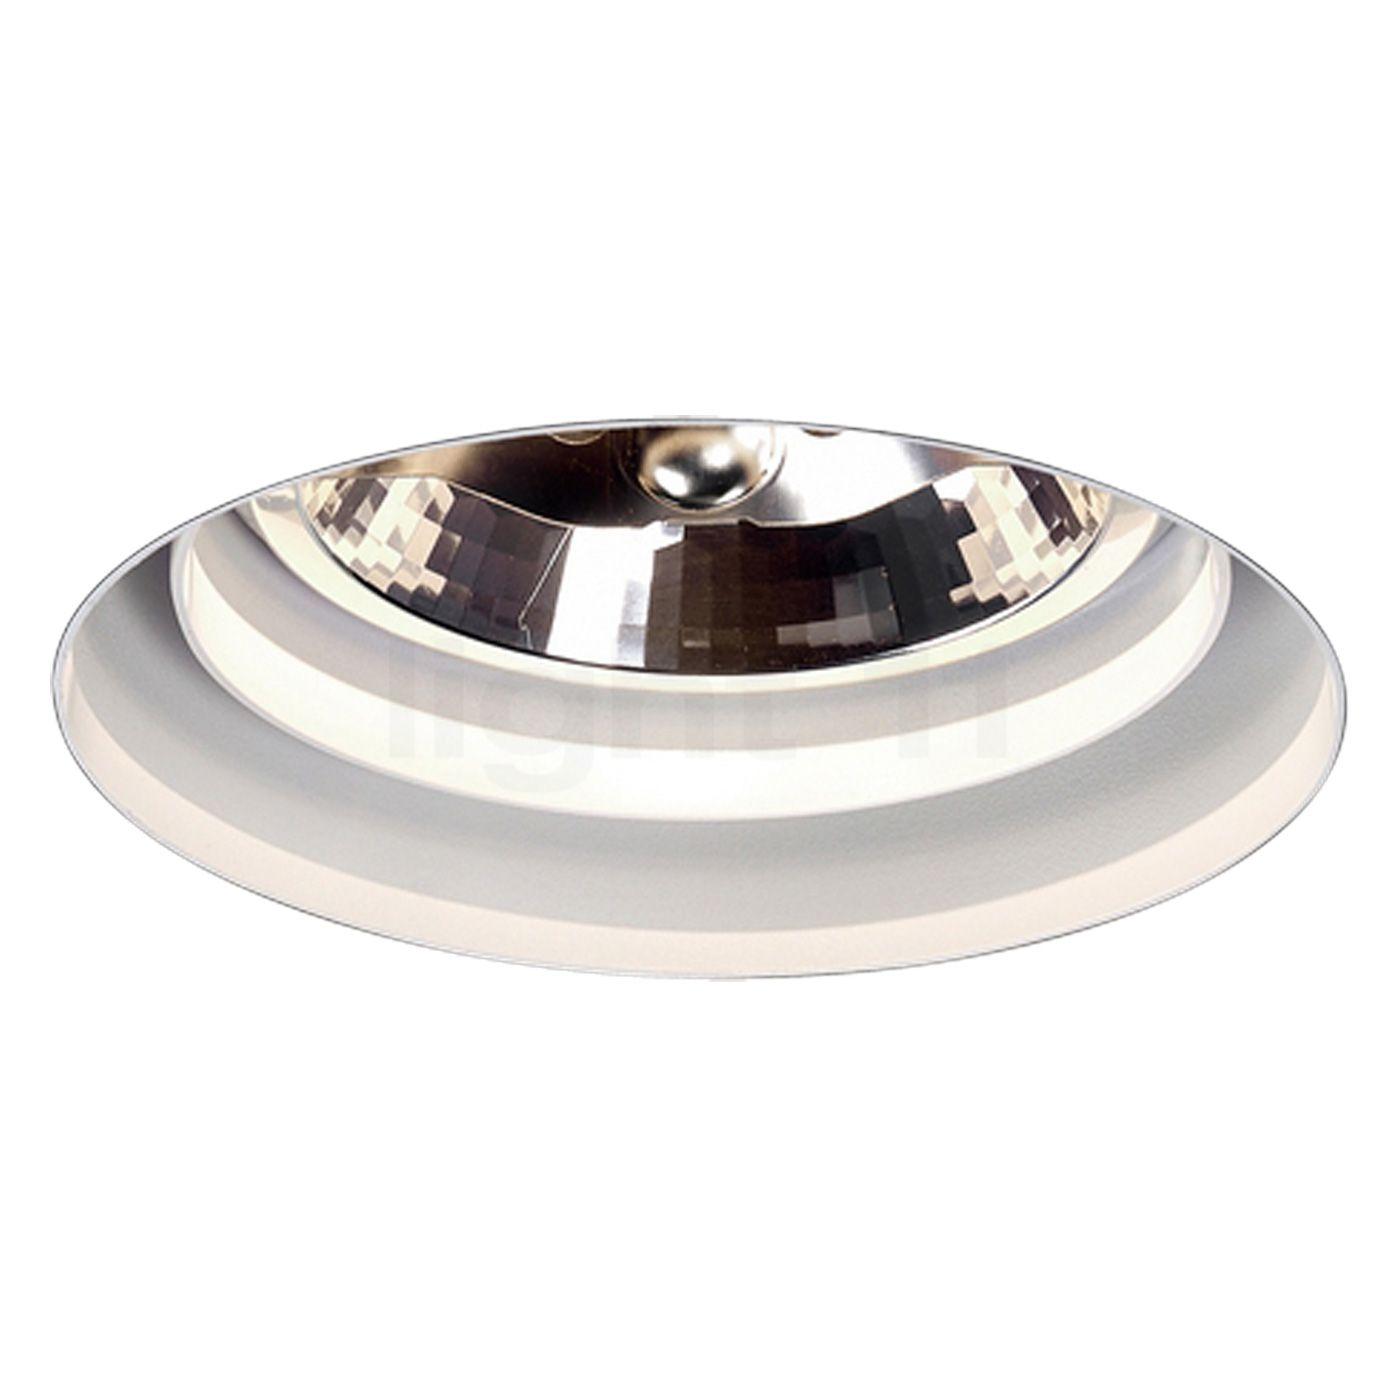 delta light grand diro trimless 111 recessed spotlights. Black Bedroom Furniture Sets. Home Design Ideas